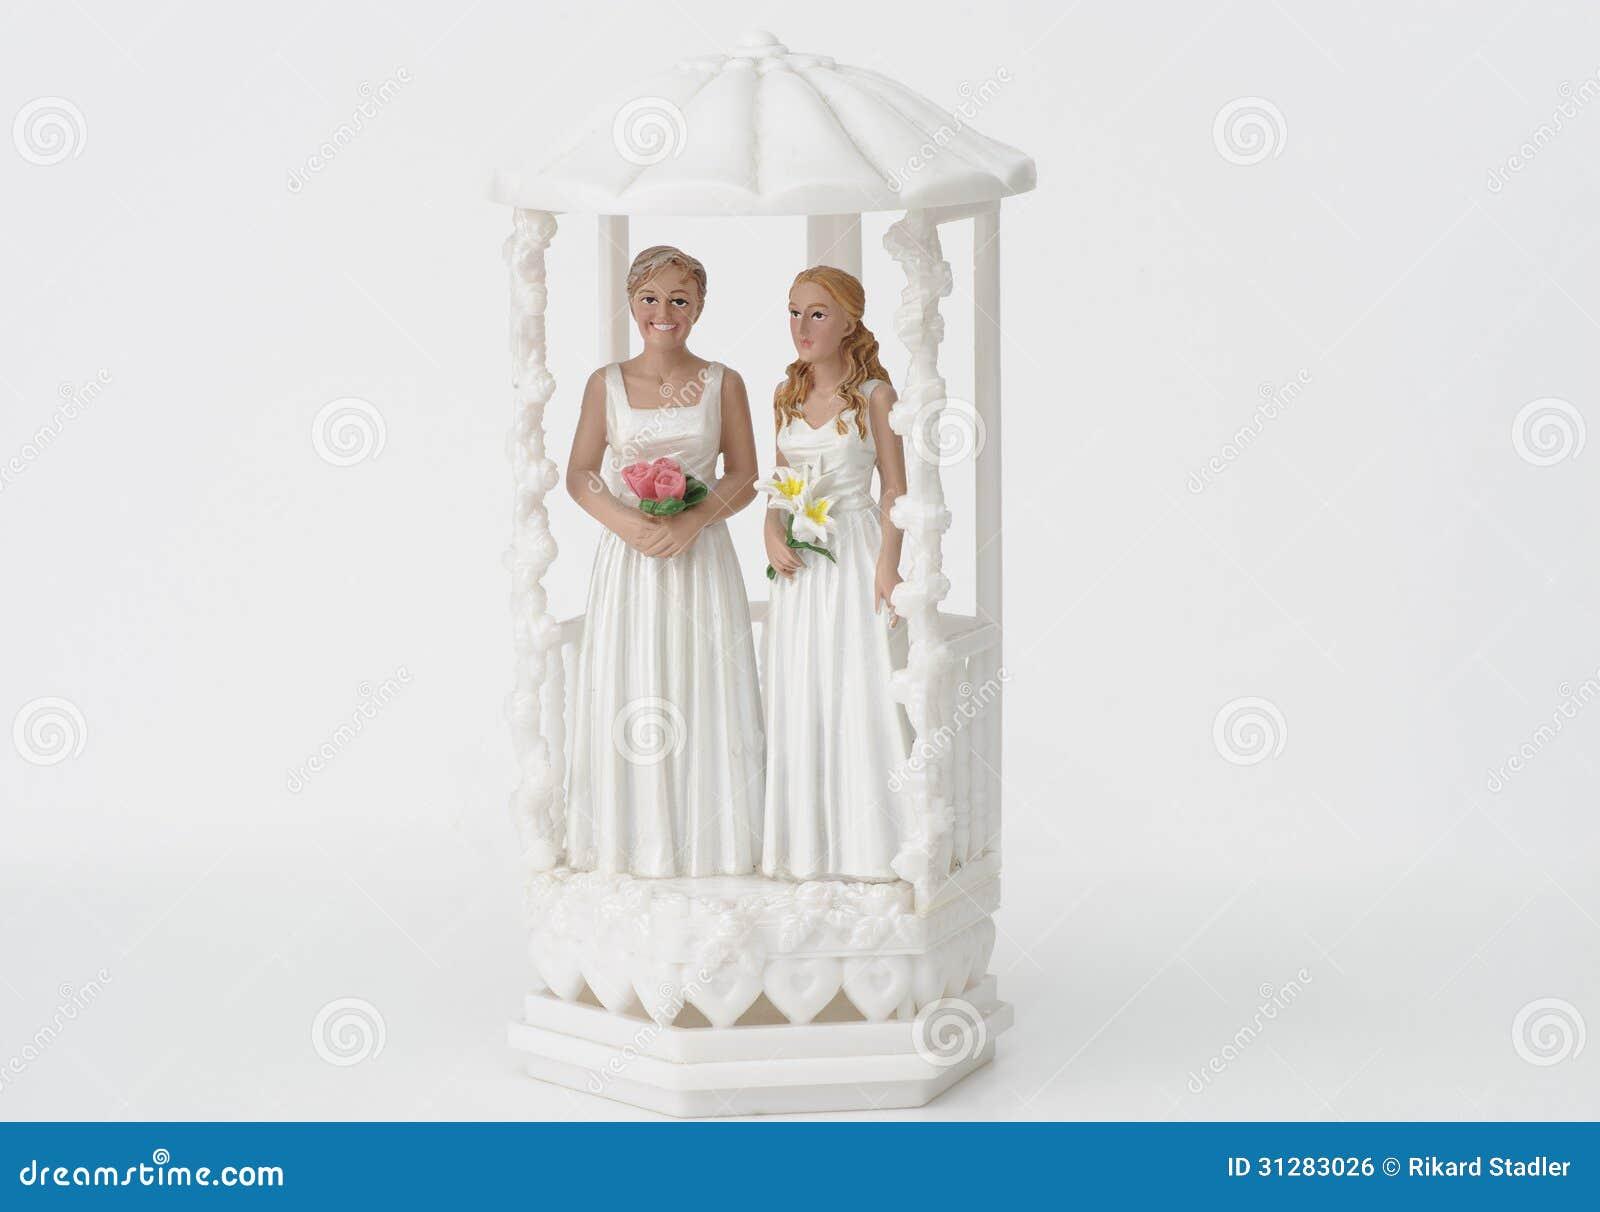 Female Wedding Couple Topper Stock Photo